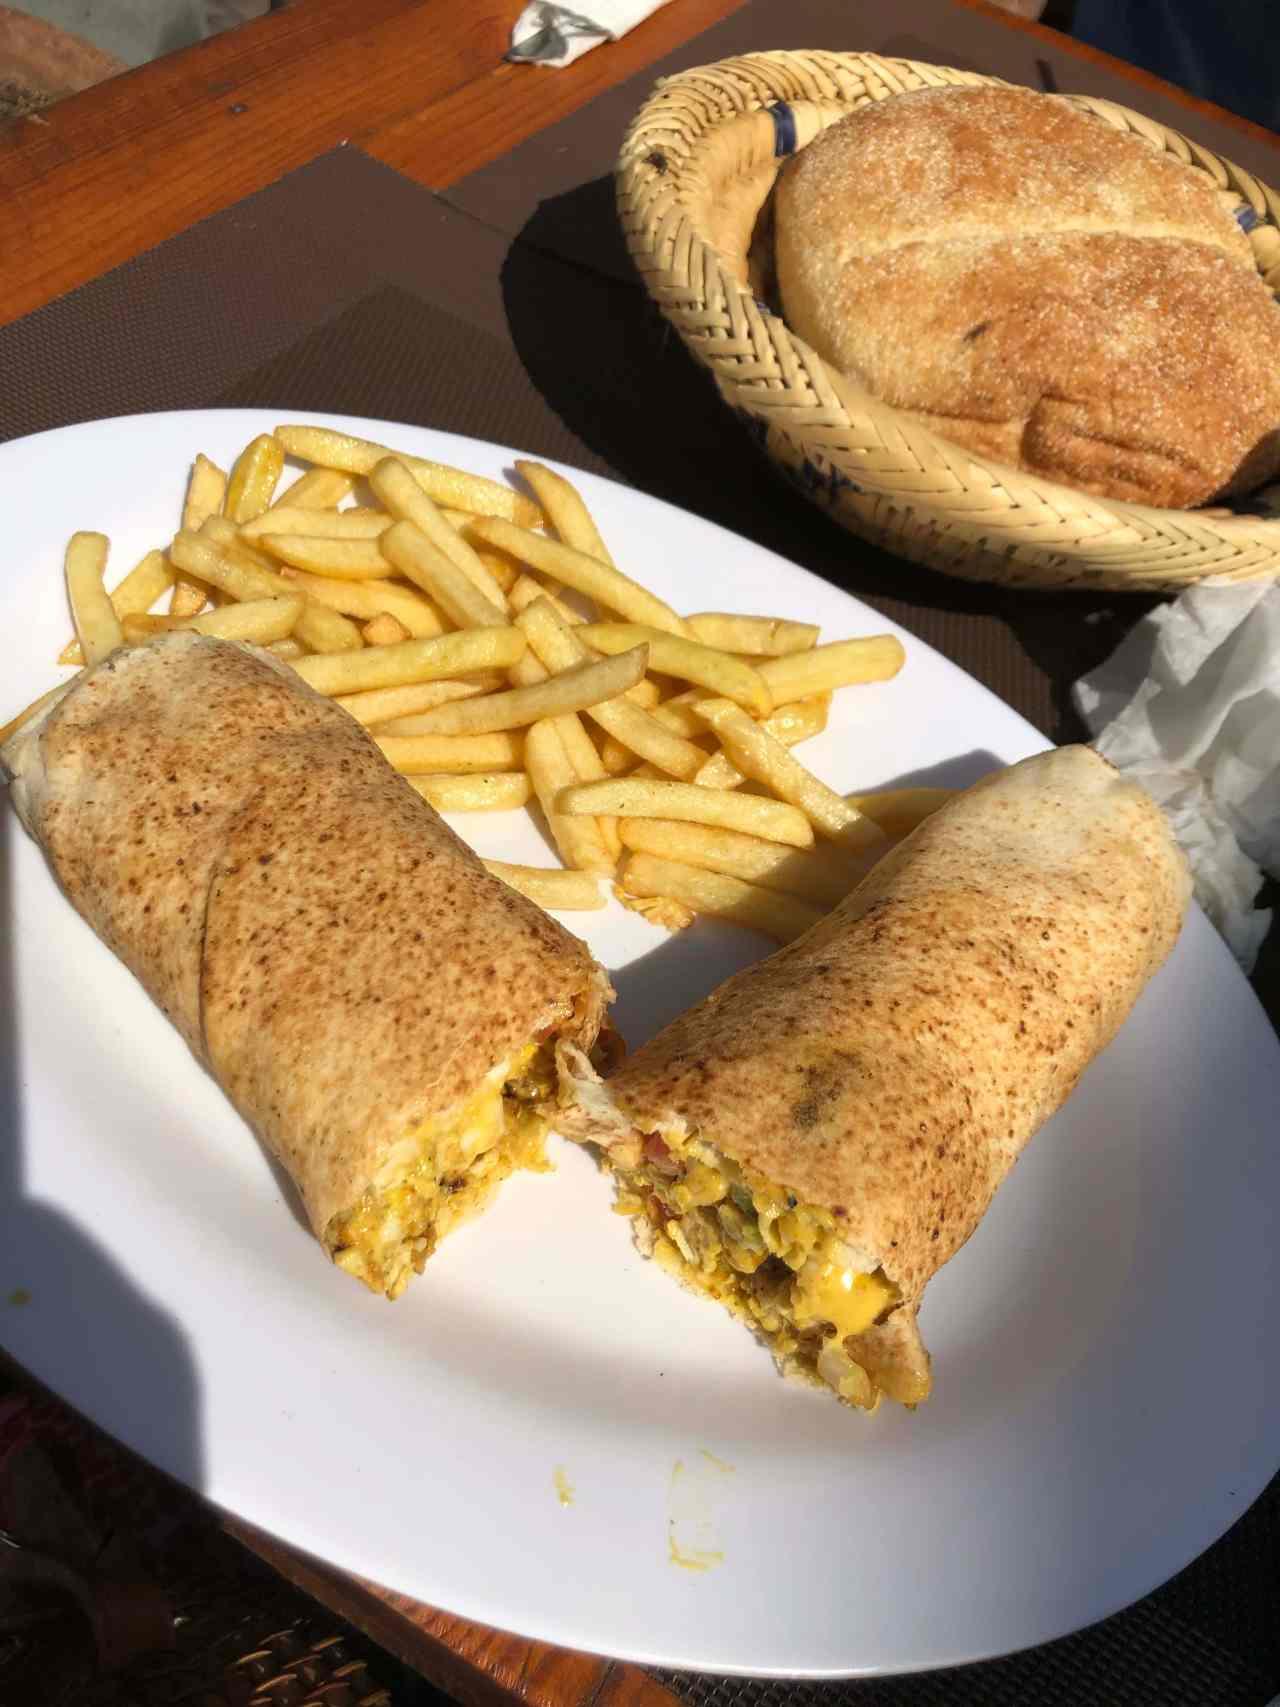 Chicken Shawarma marrakech